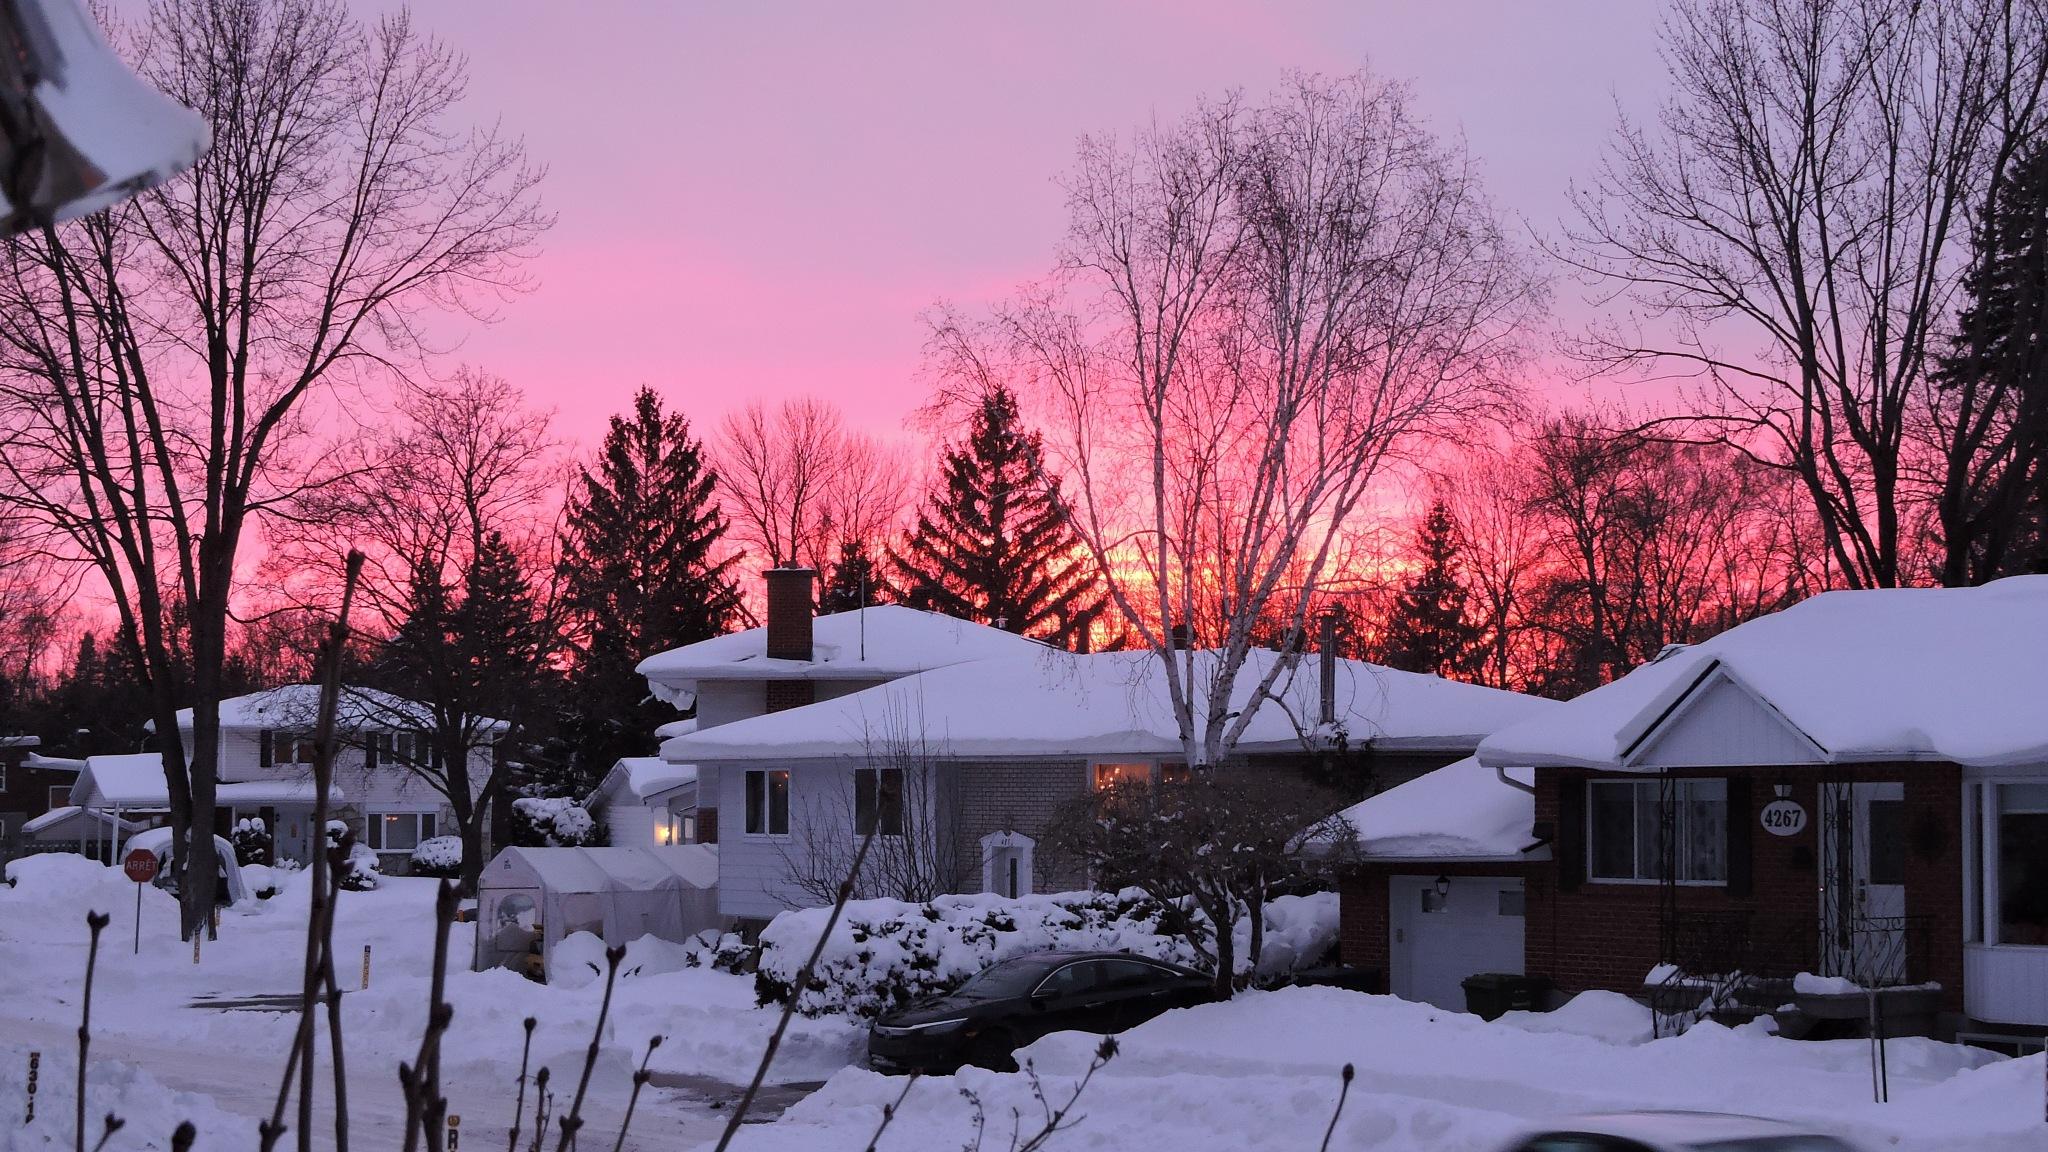 Winter sunset  by Janice Bradford